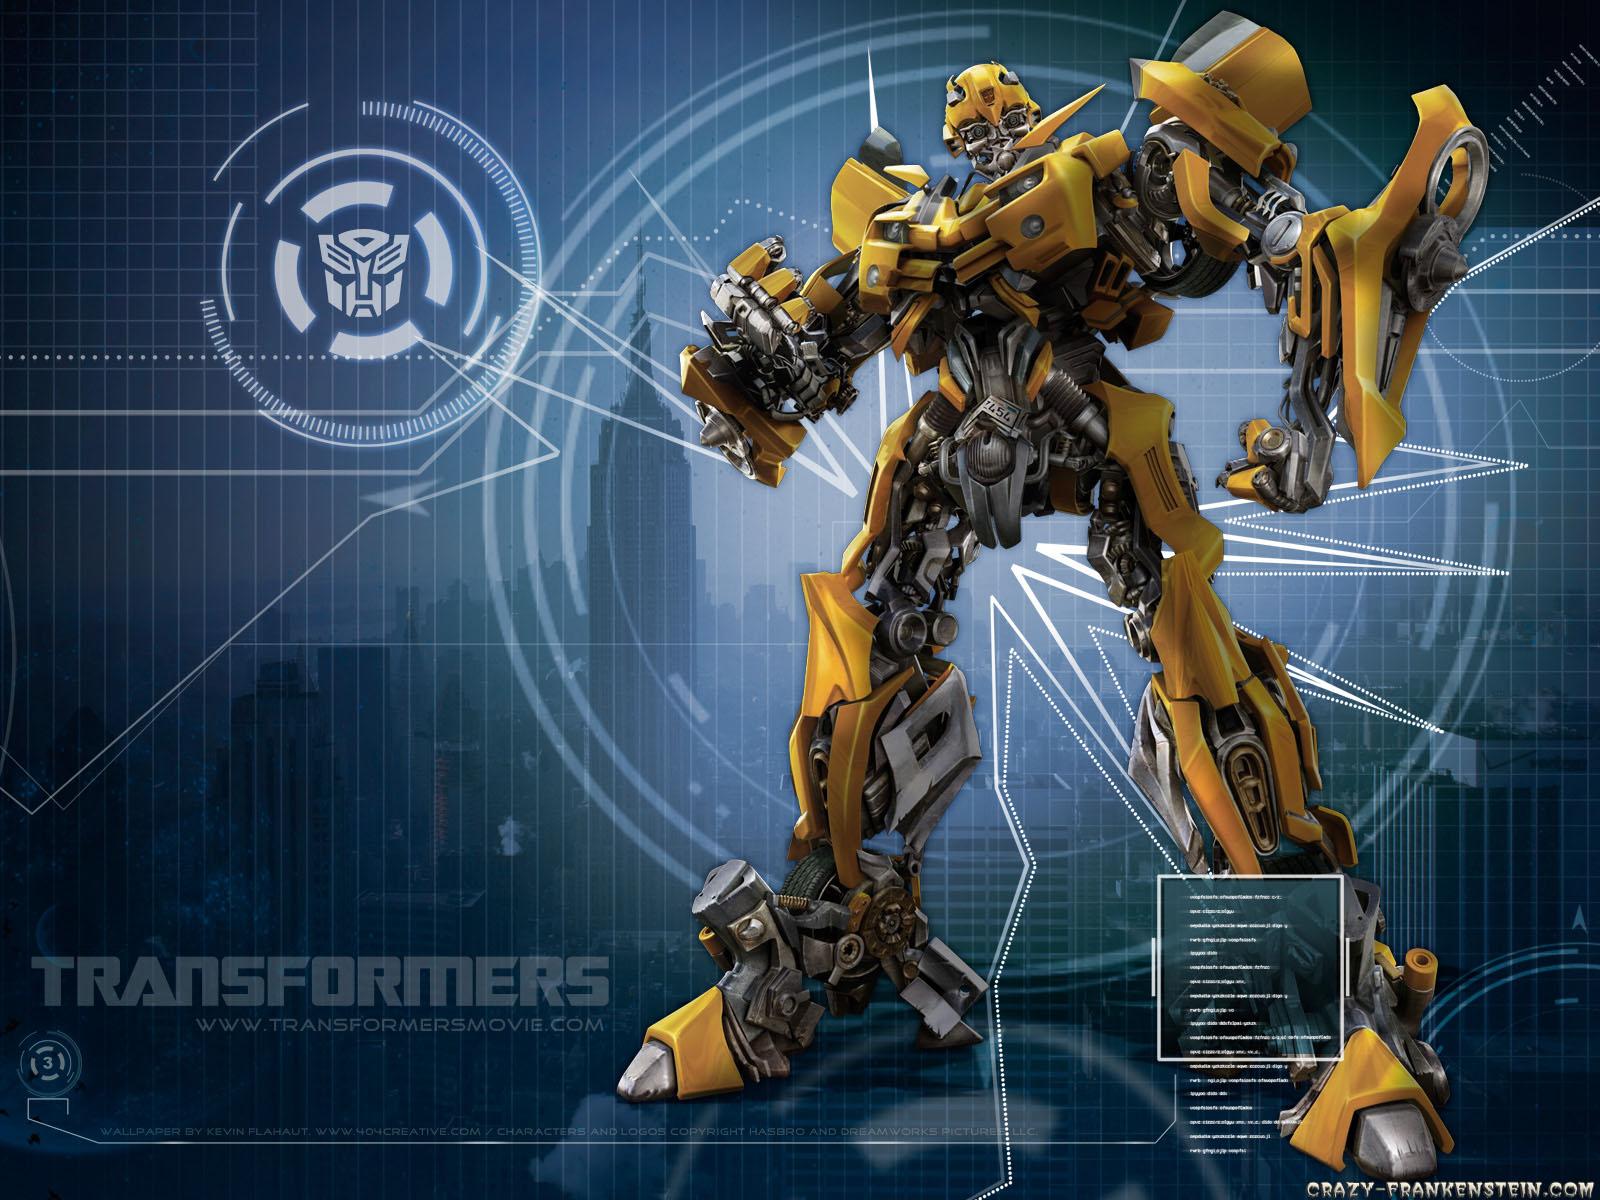 bumblebee wallpaper 1600x1200 1600x1200